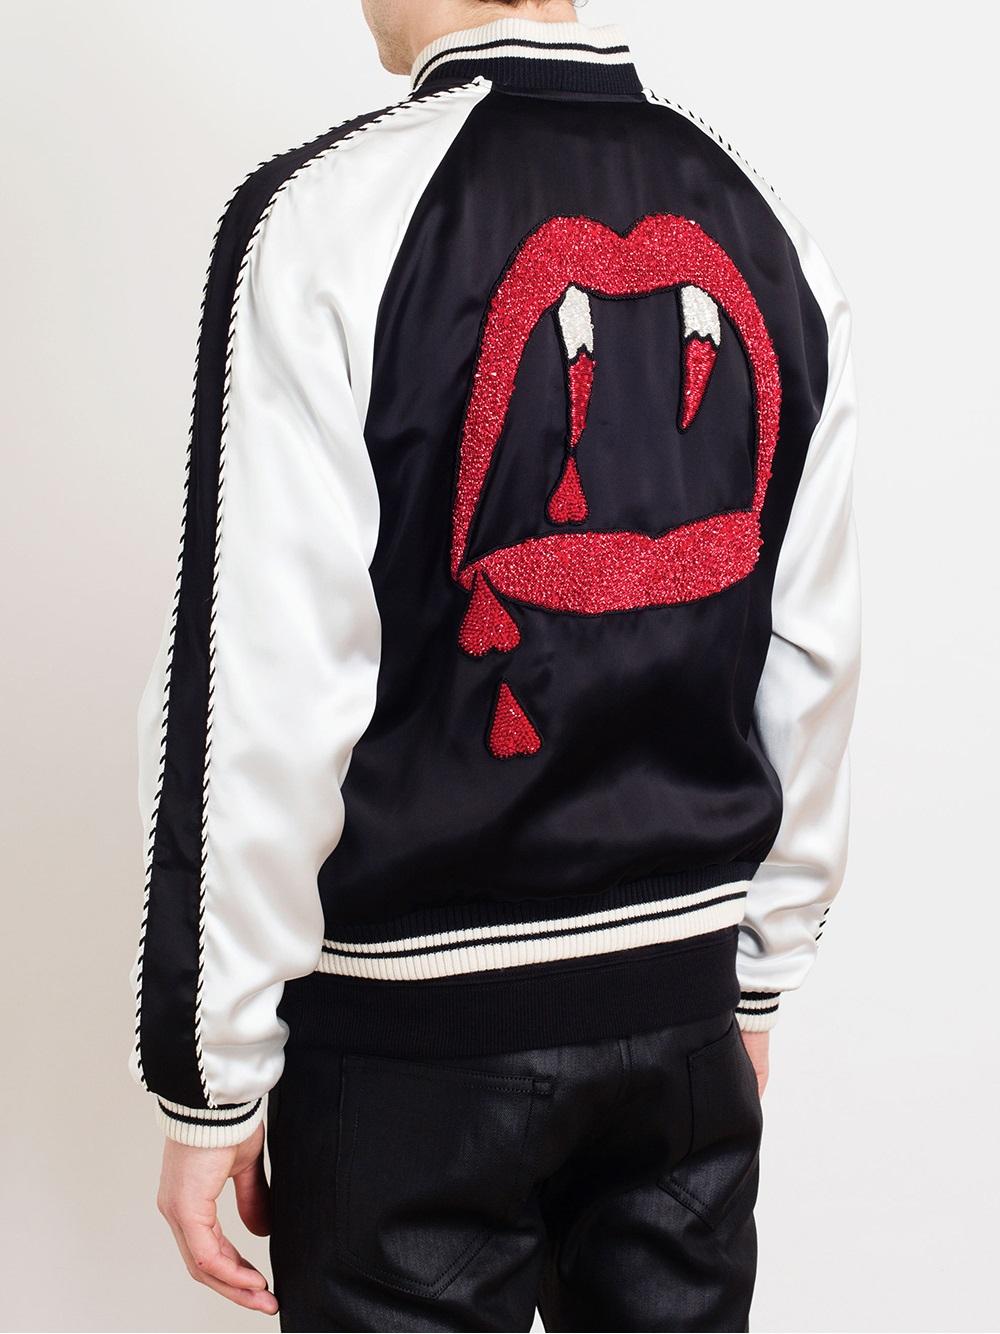 Polo Wallpaper For Iphone Saint Laurent Vampire Motif Satin Bomber Jacket In Black